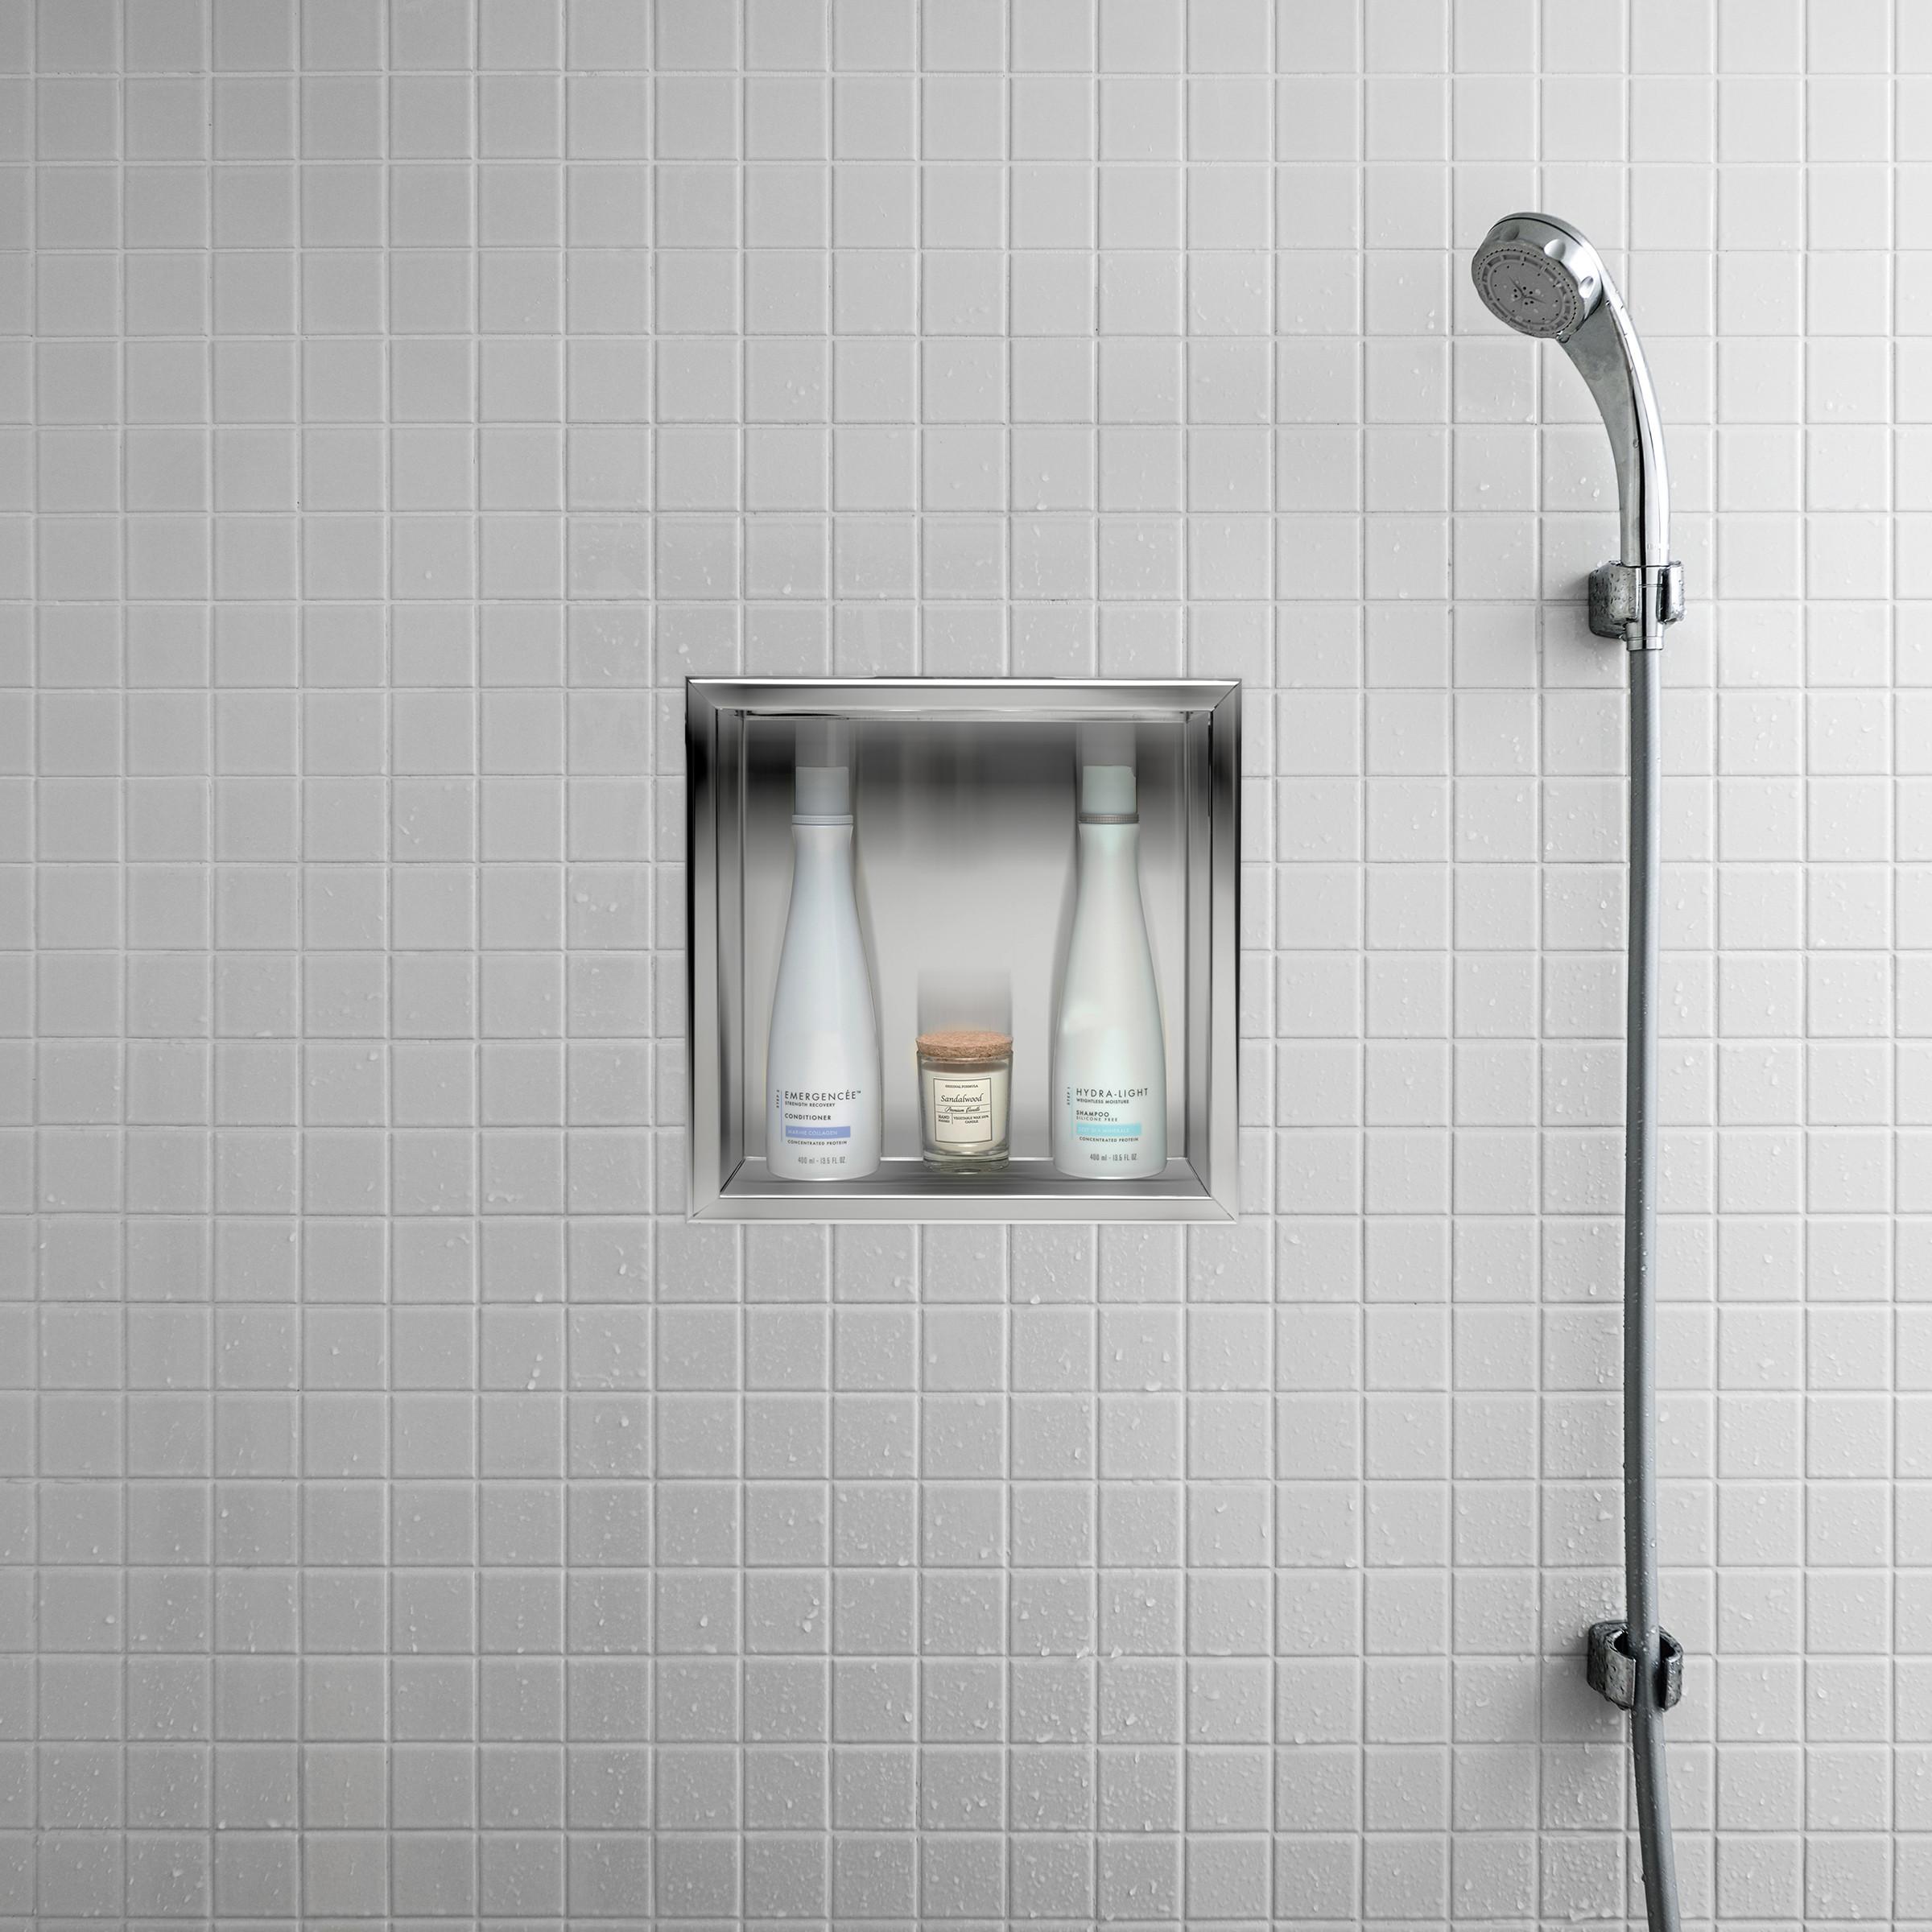 Alfi Brand Abn1212 12 X 12 Square Single Shelf Bath Shower